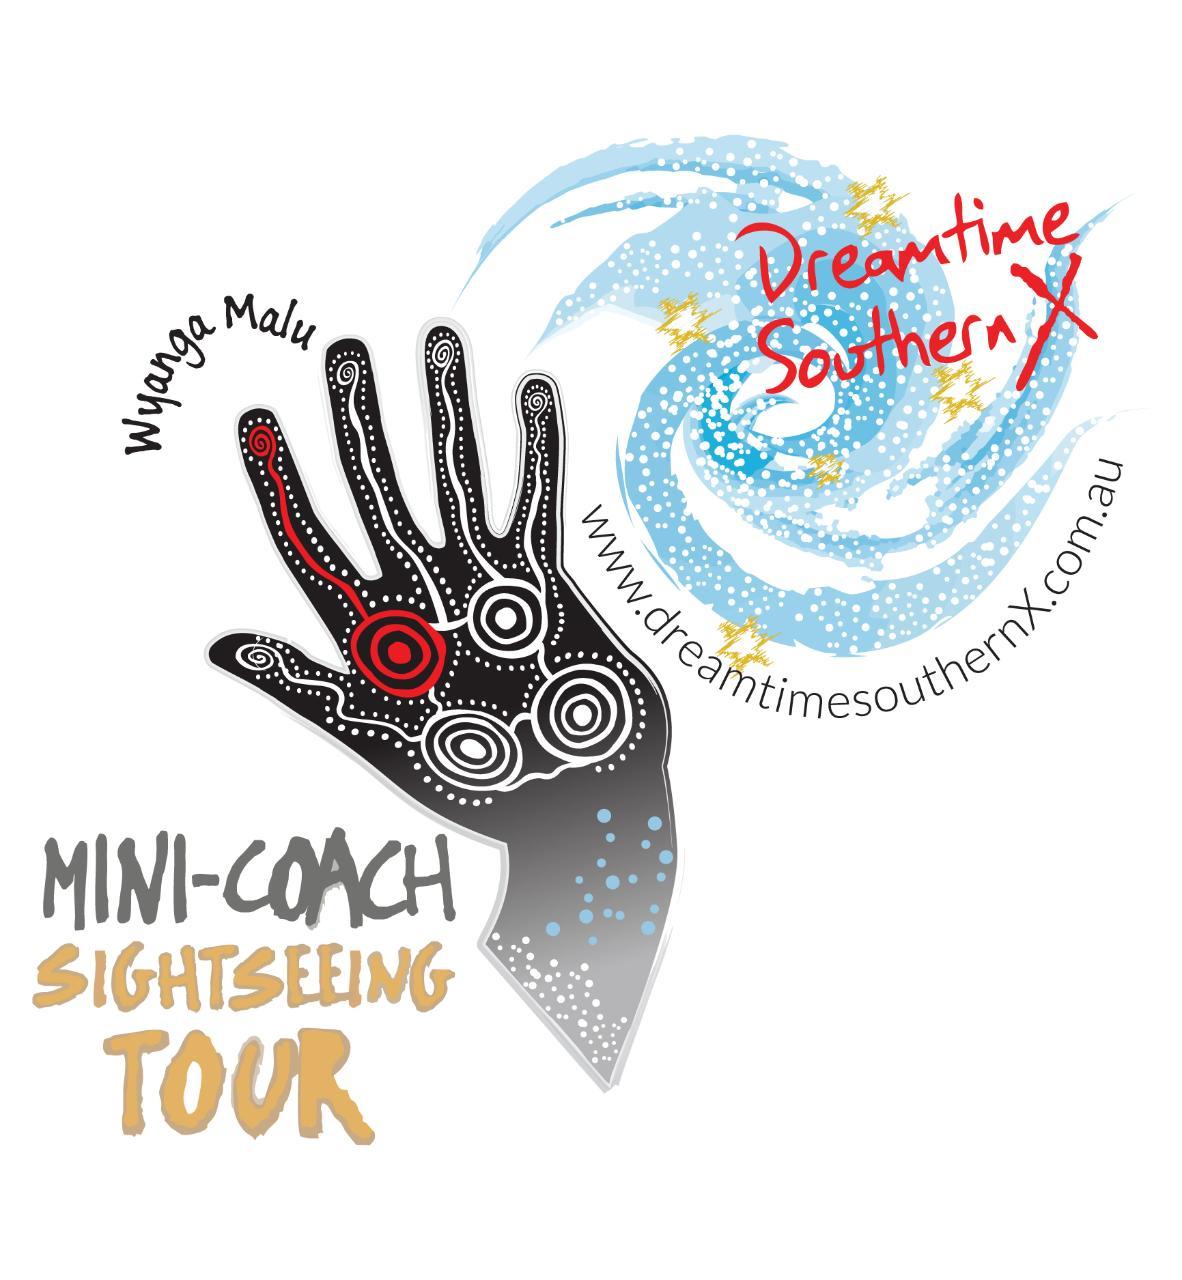 Wyanga Malu  - Aboriginal Welcome to Sydney -  Mini Coach Sightseeing Tour (Exclusive/private tours)